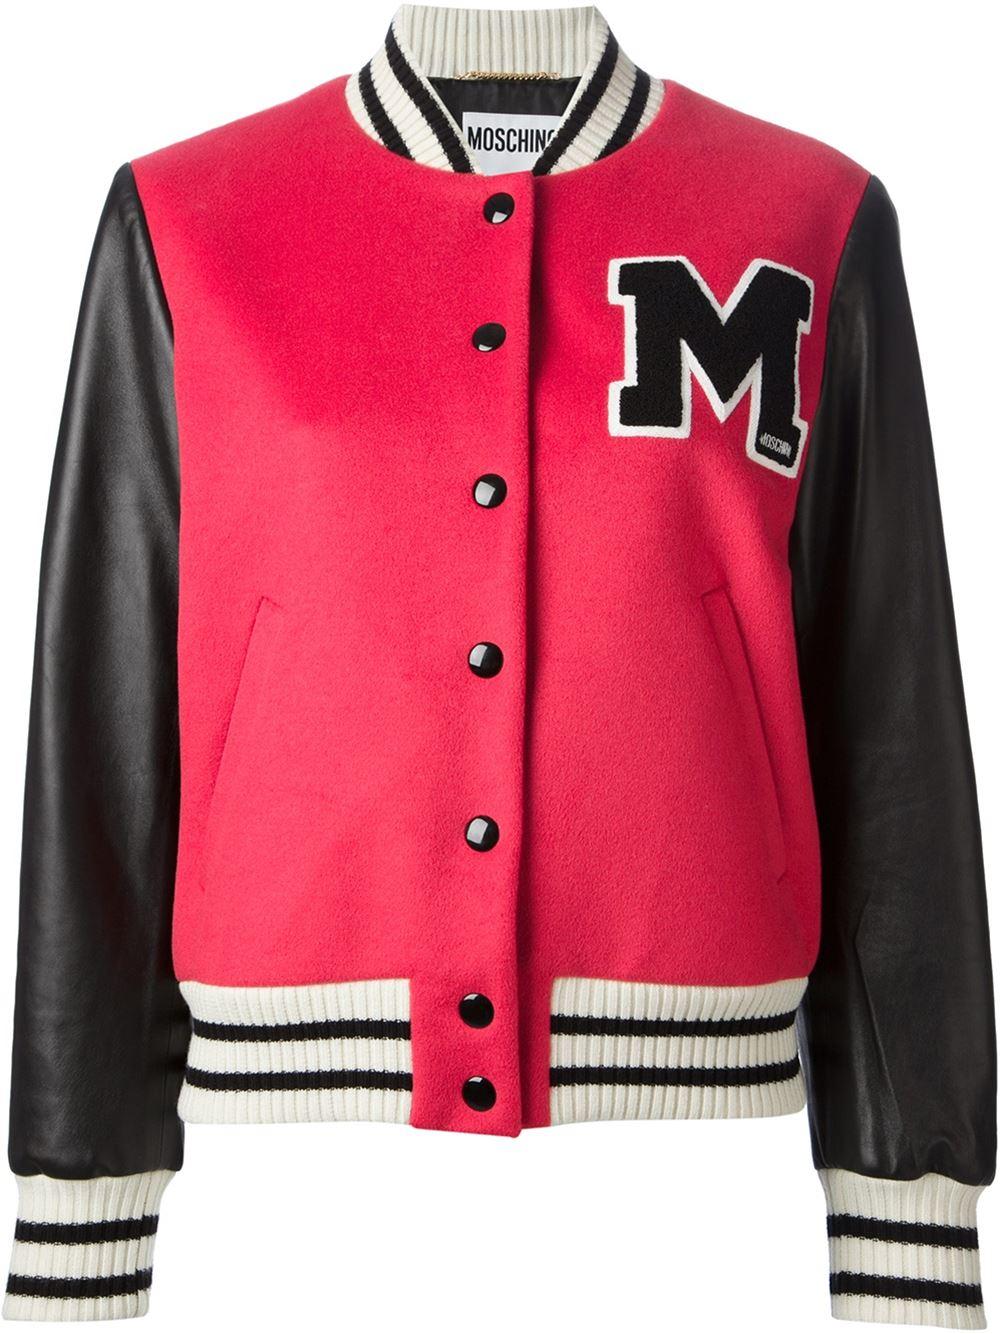 Red and white bomber jacket – New Fashion Photo Blog